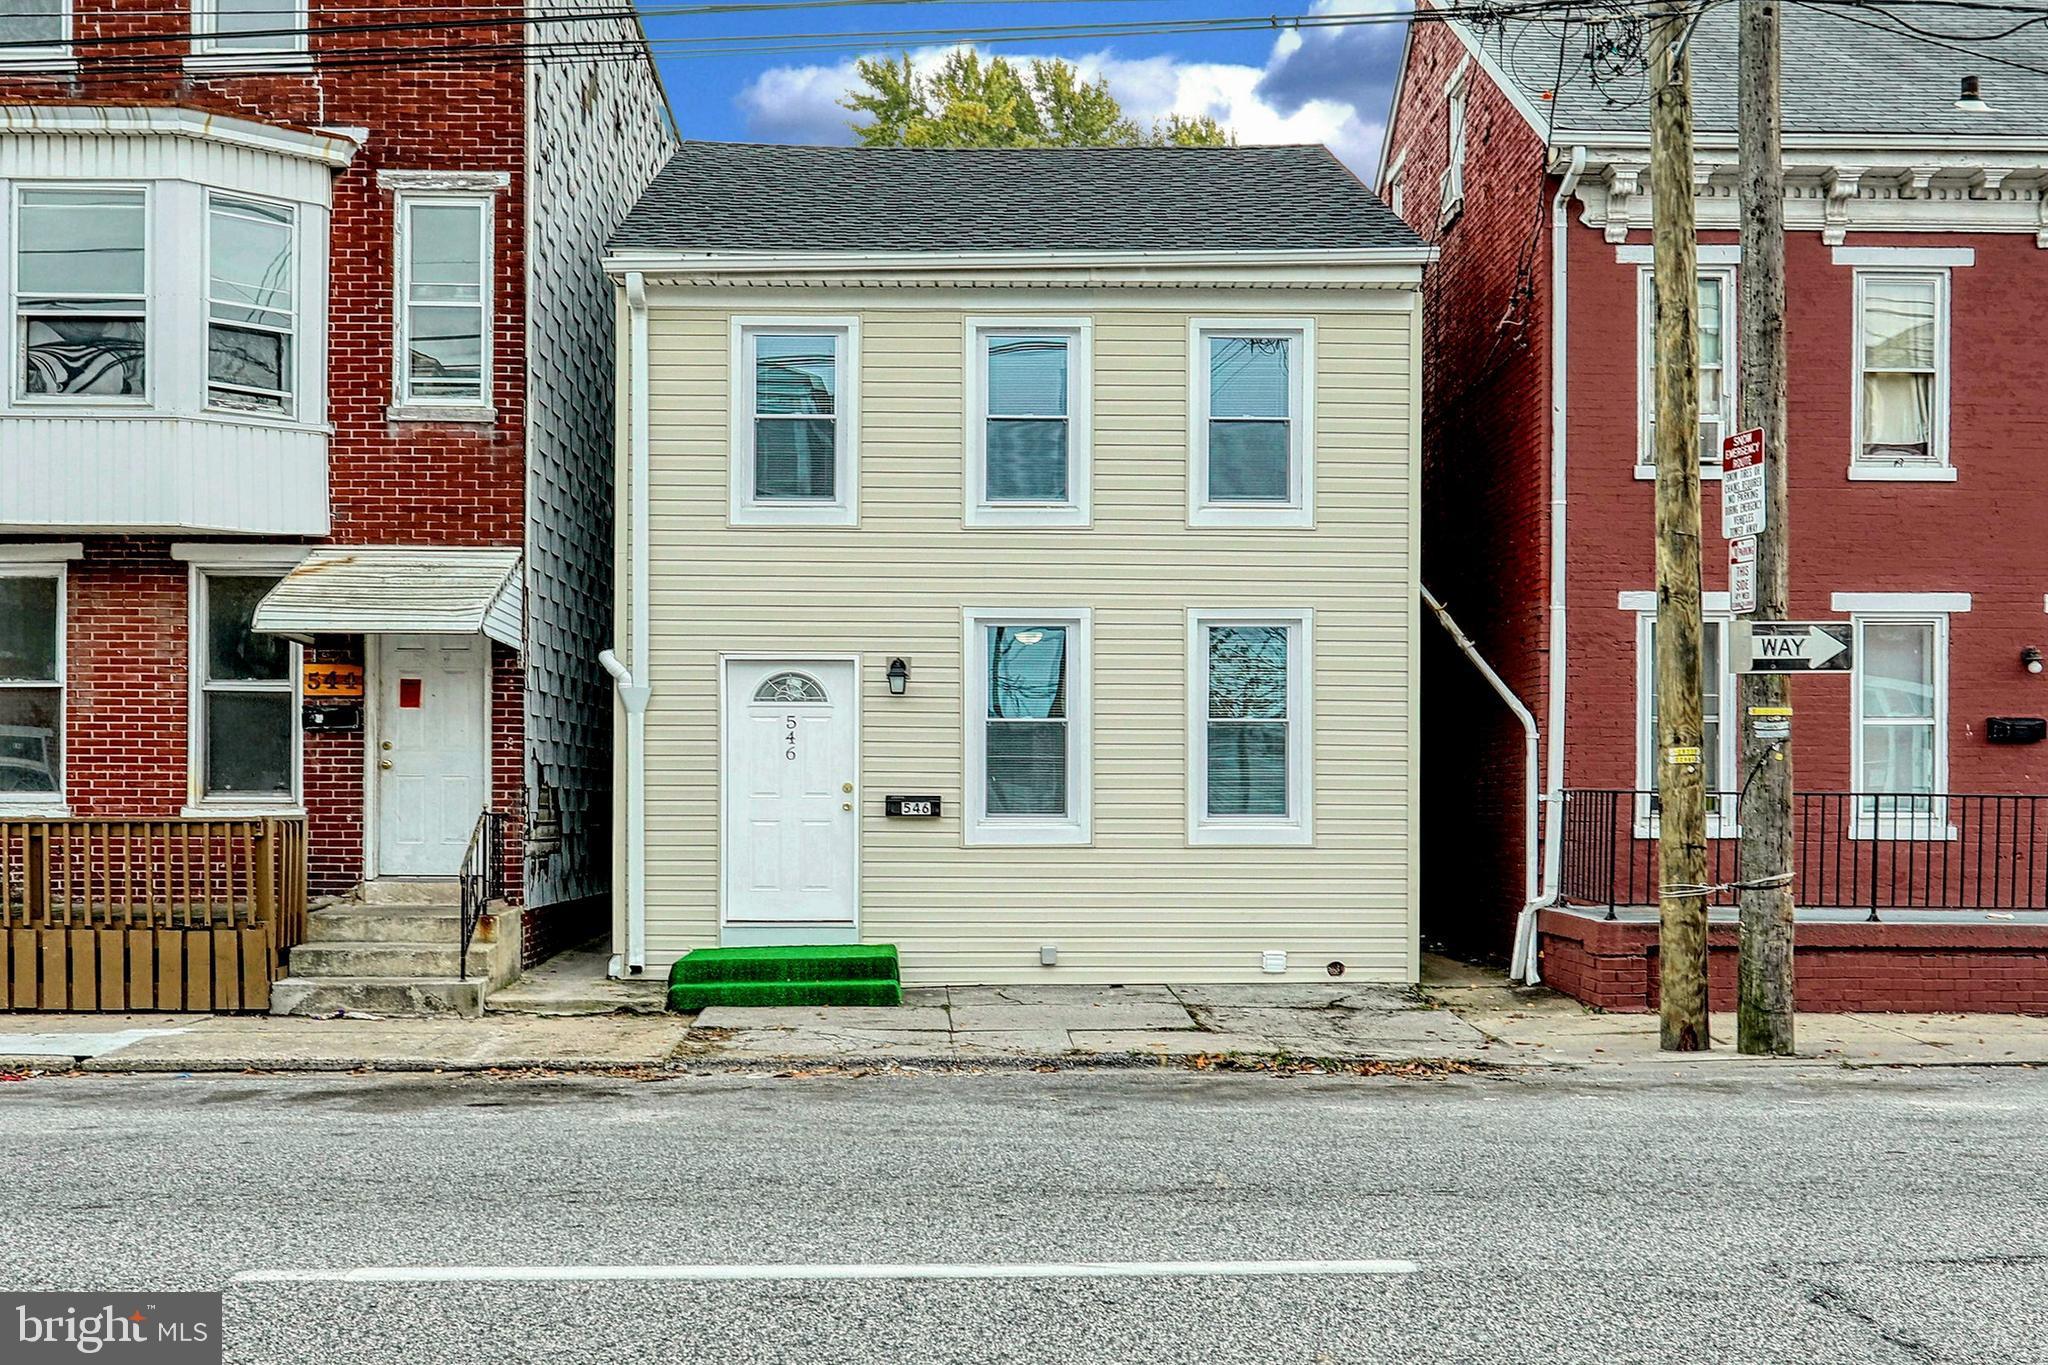 546 W PHILADELPHIA STREET, YORK, PA 17401